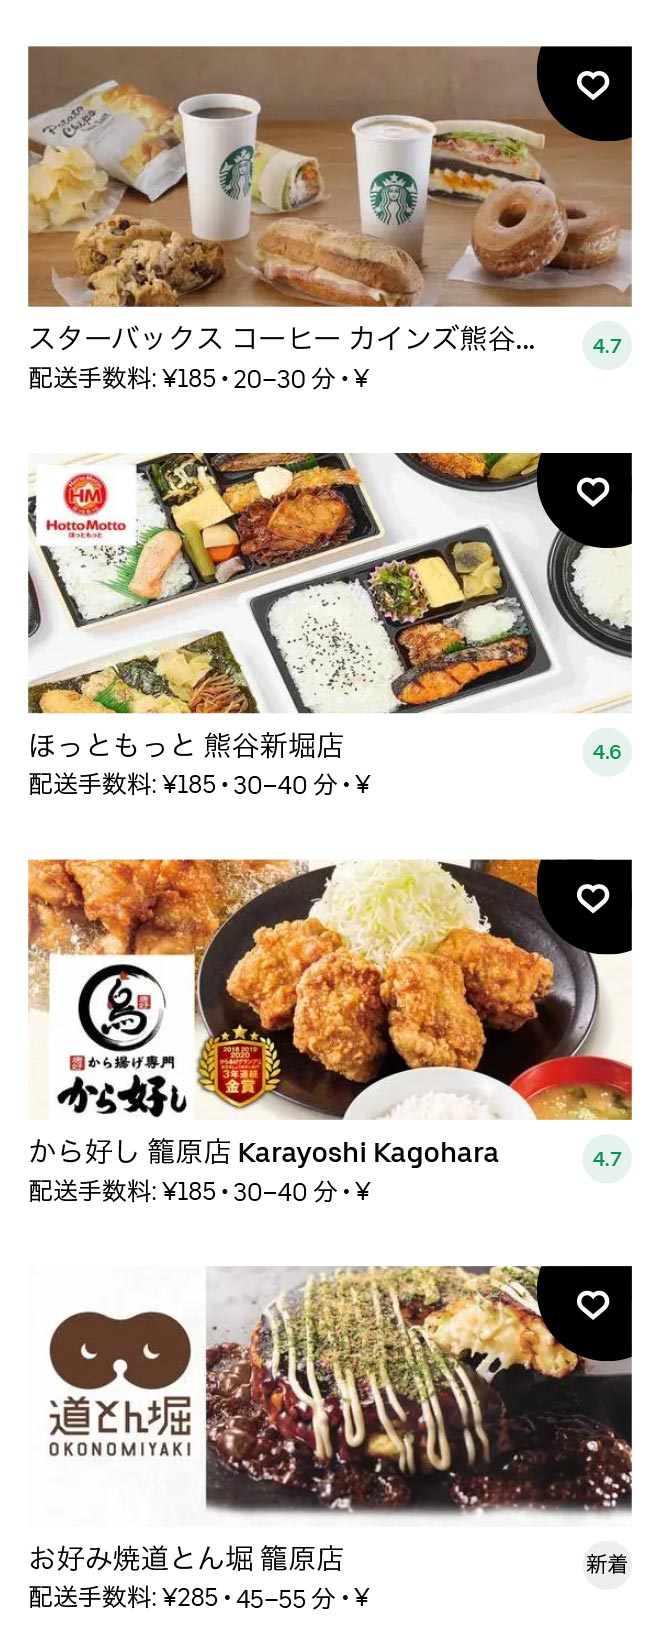 Kagohara menu 2101 02